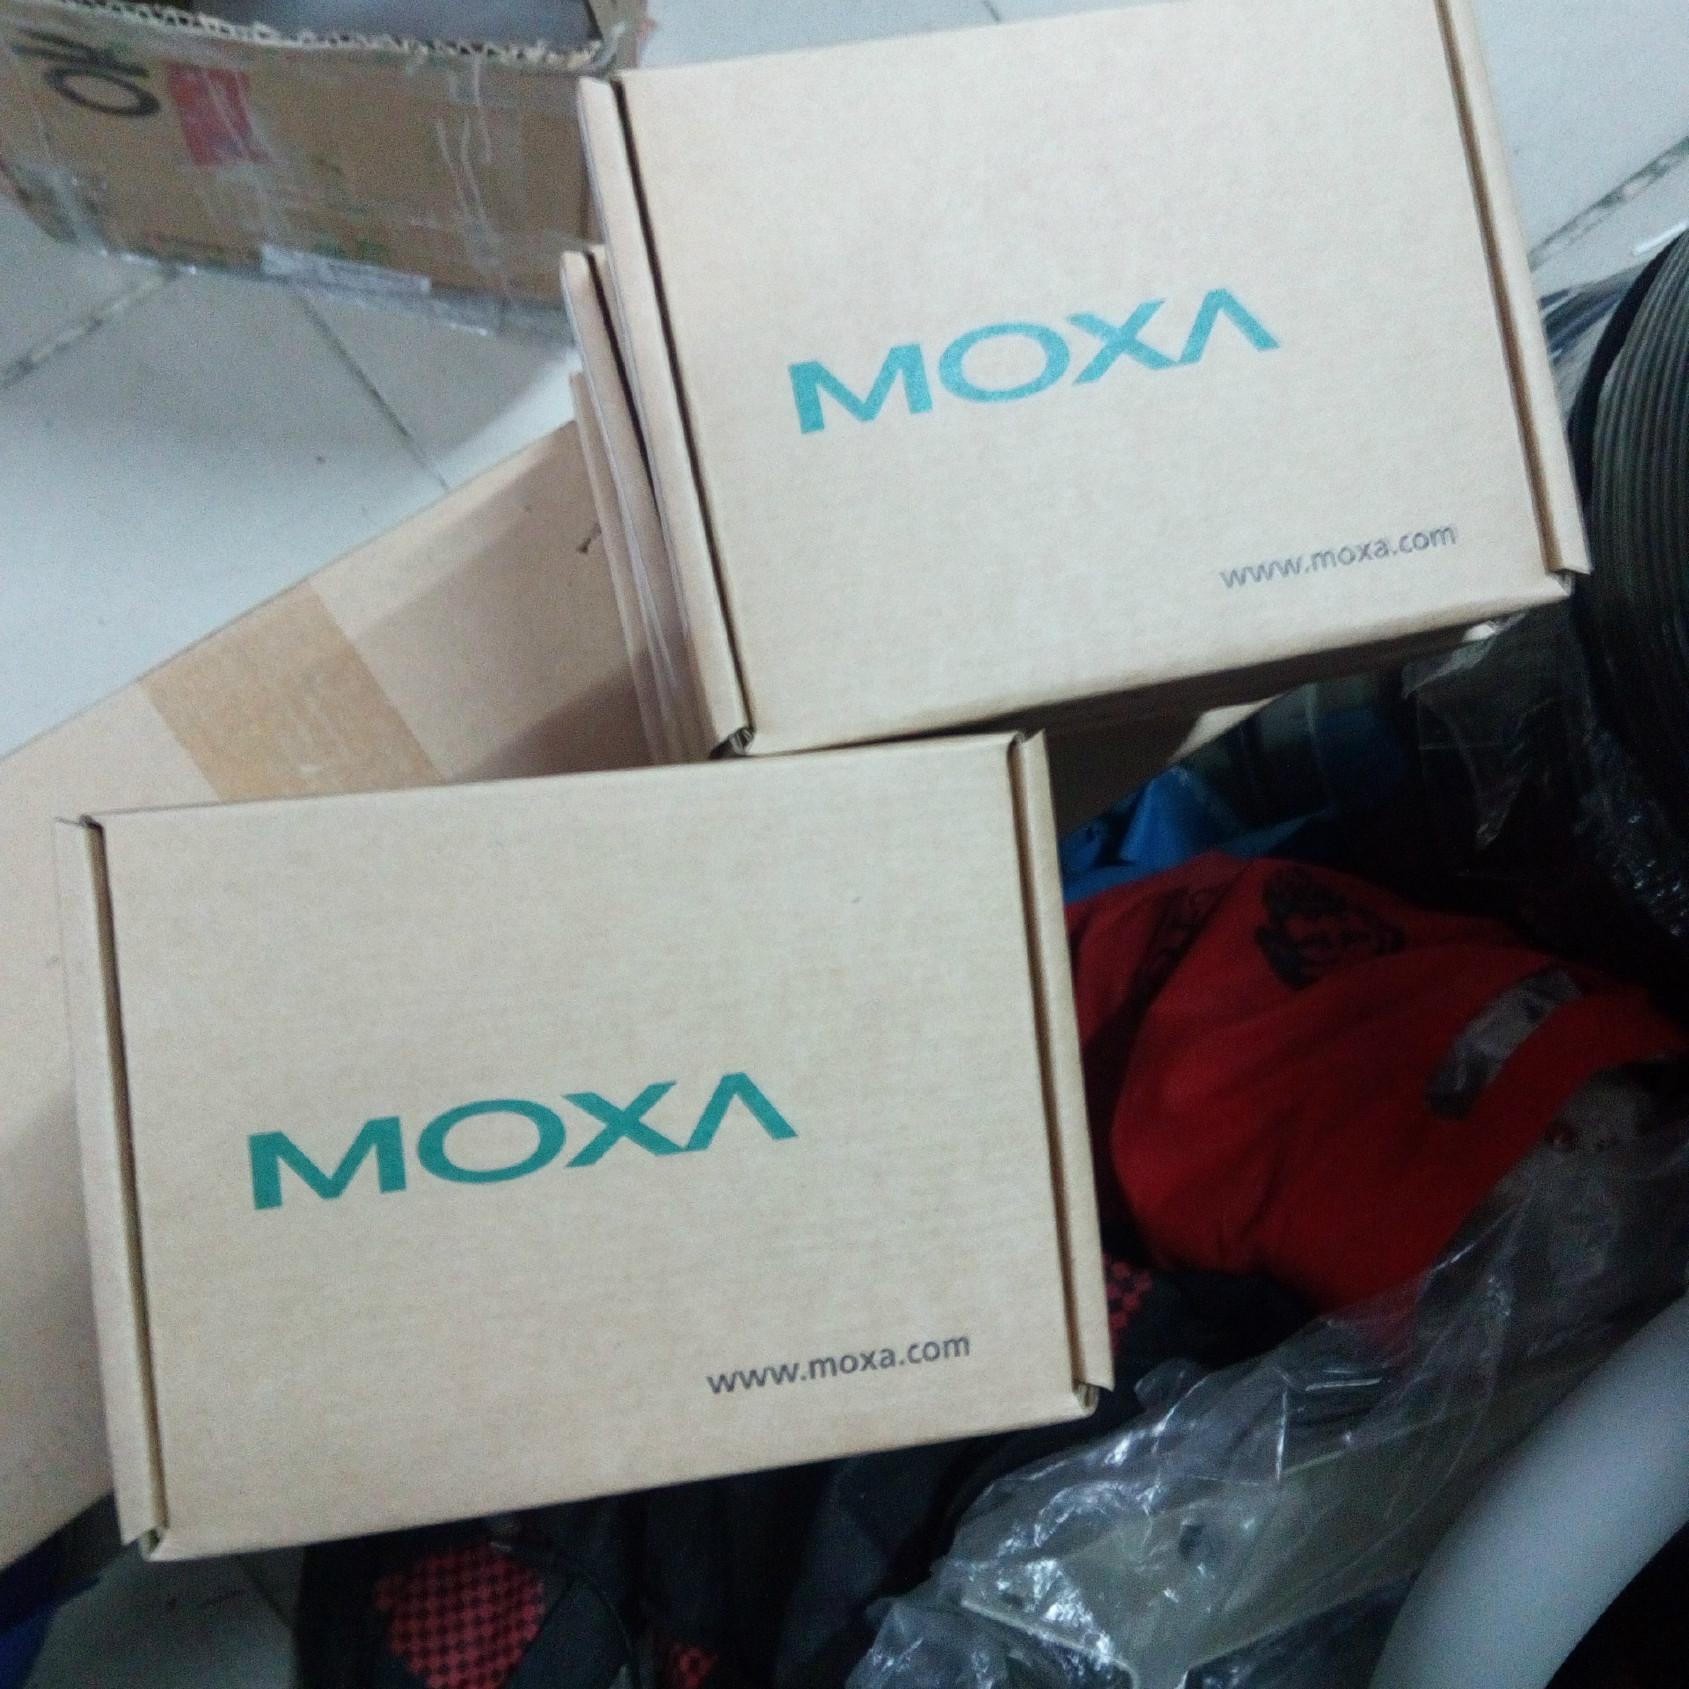 moxa 工业级光收发器100M接口st sc 型号ma21示例图8